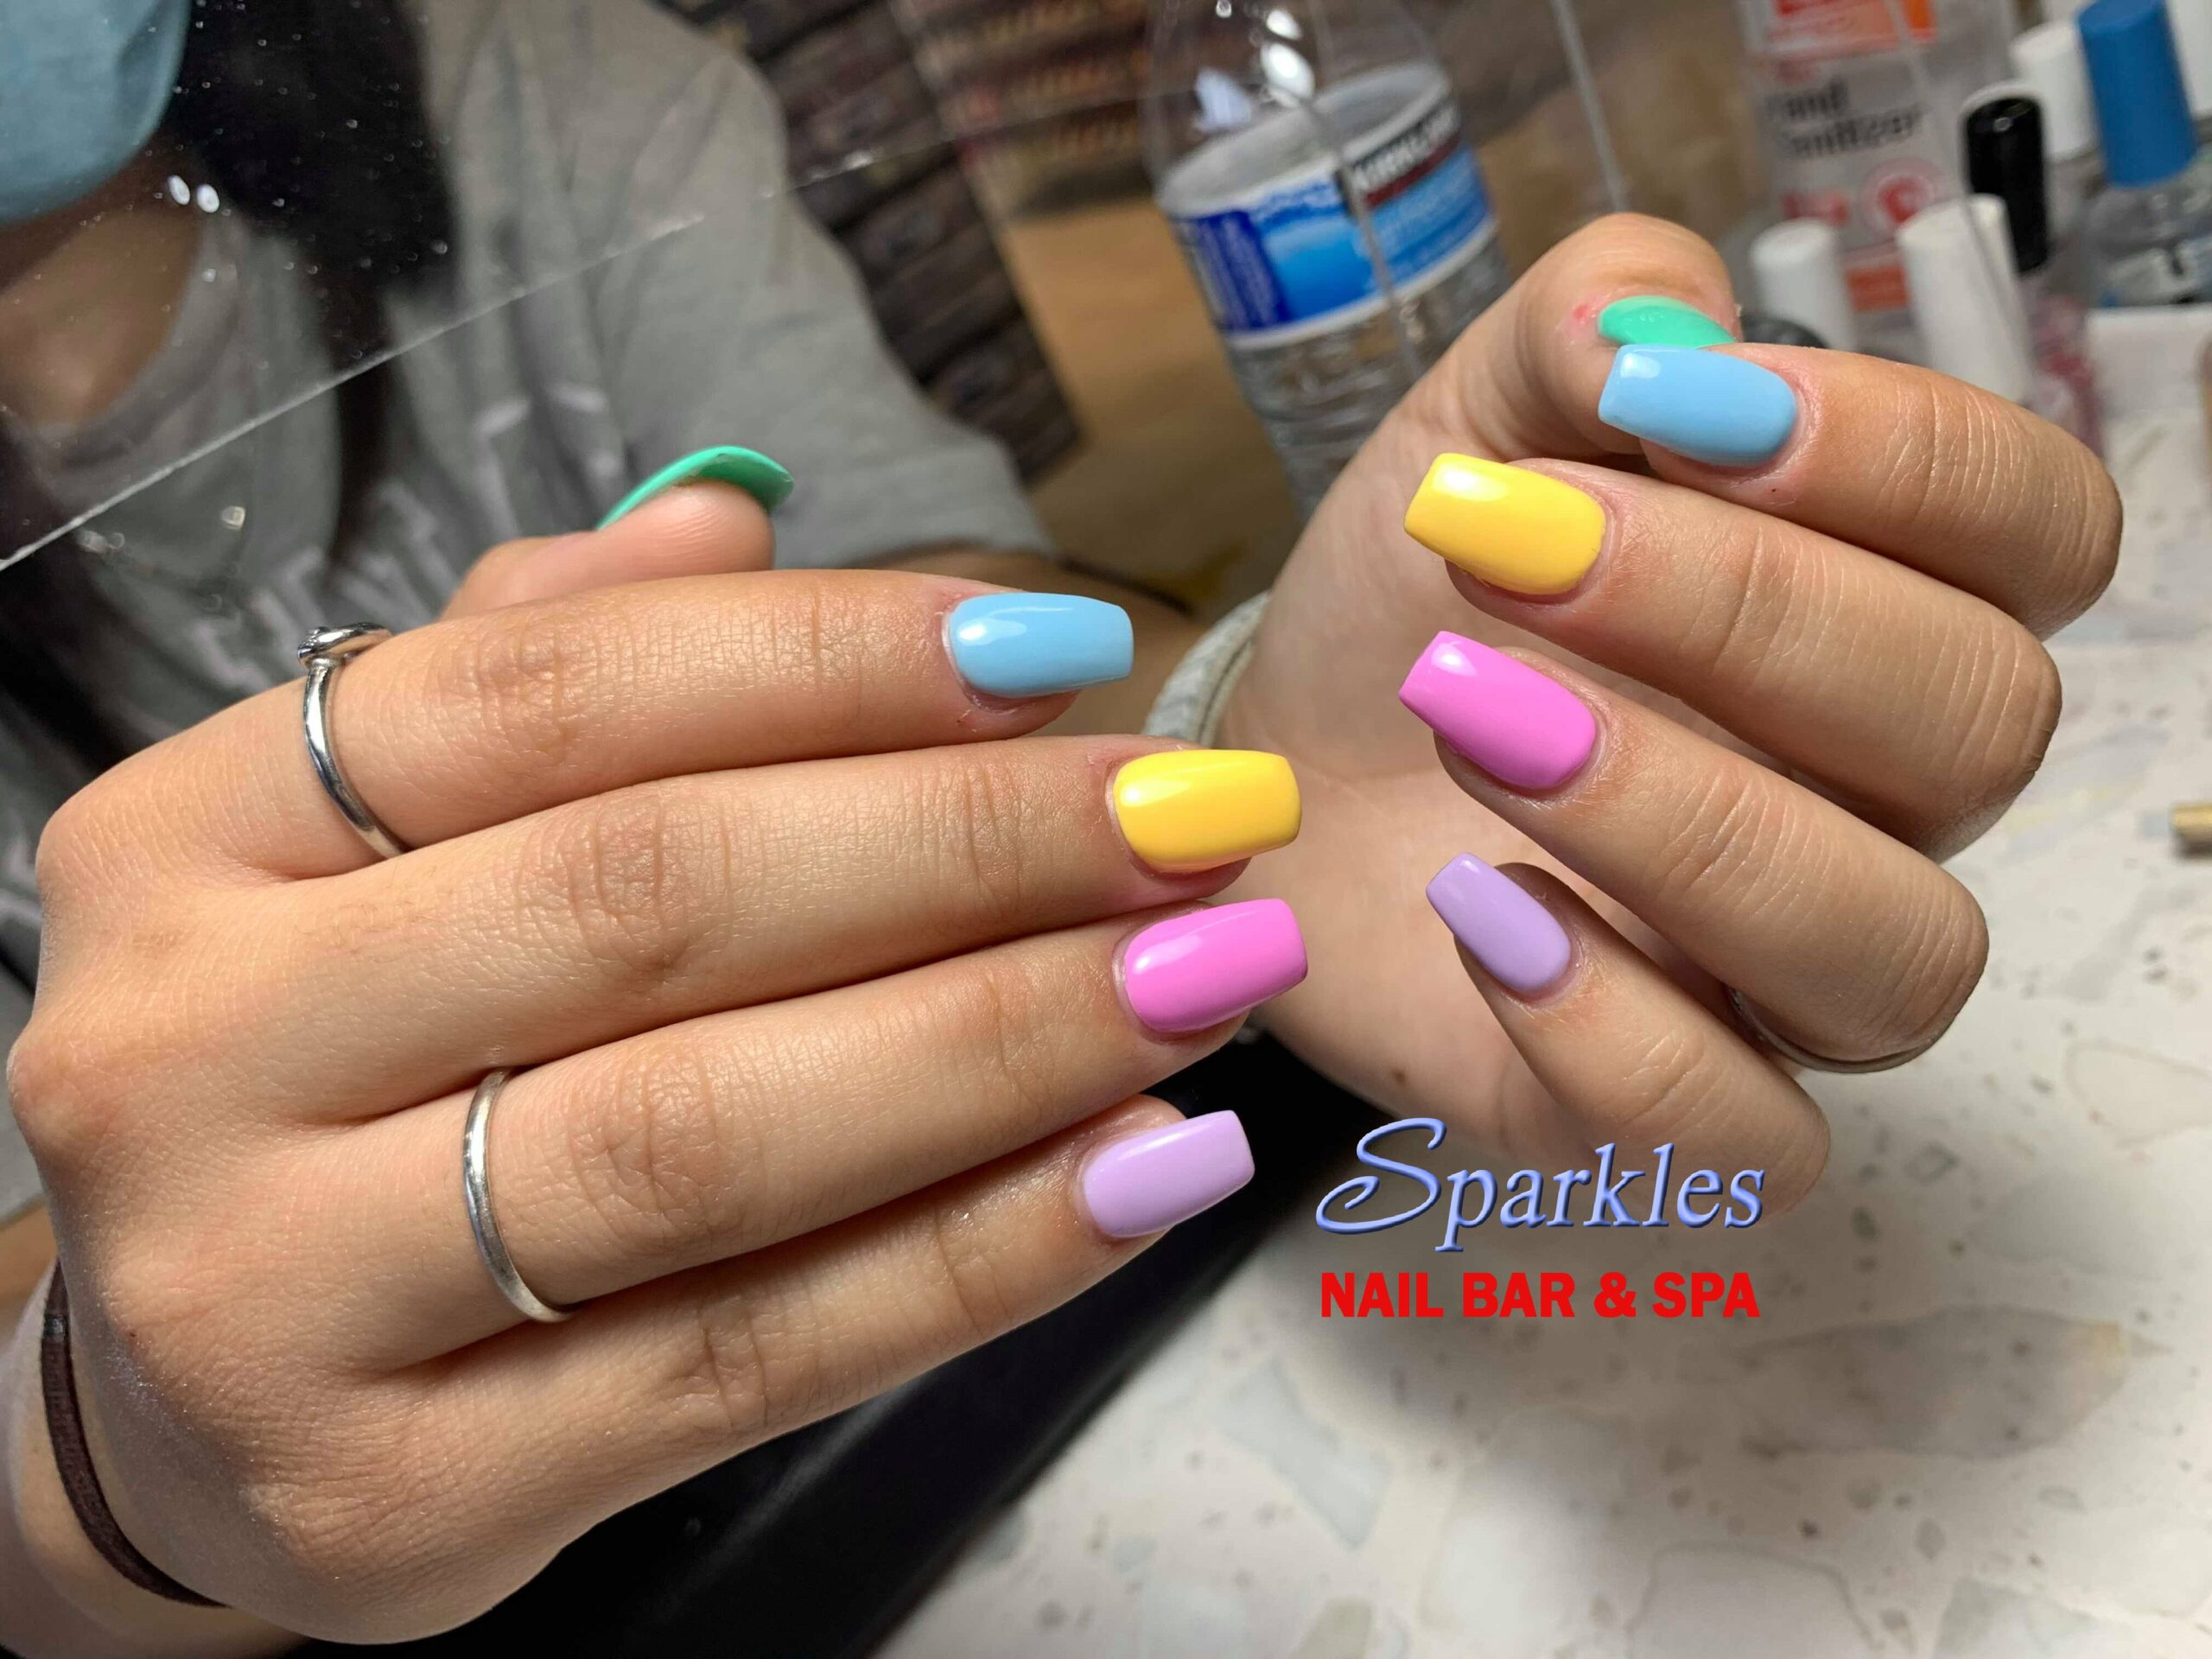 Gallery - Sparkles Nail Bar & Spa, San Antonio TX 78258